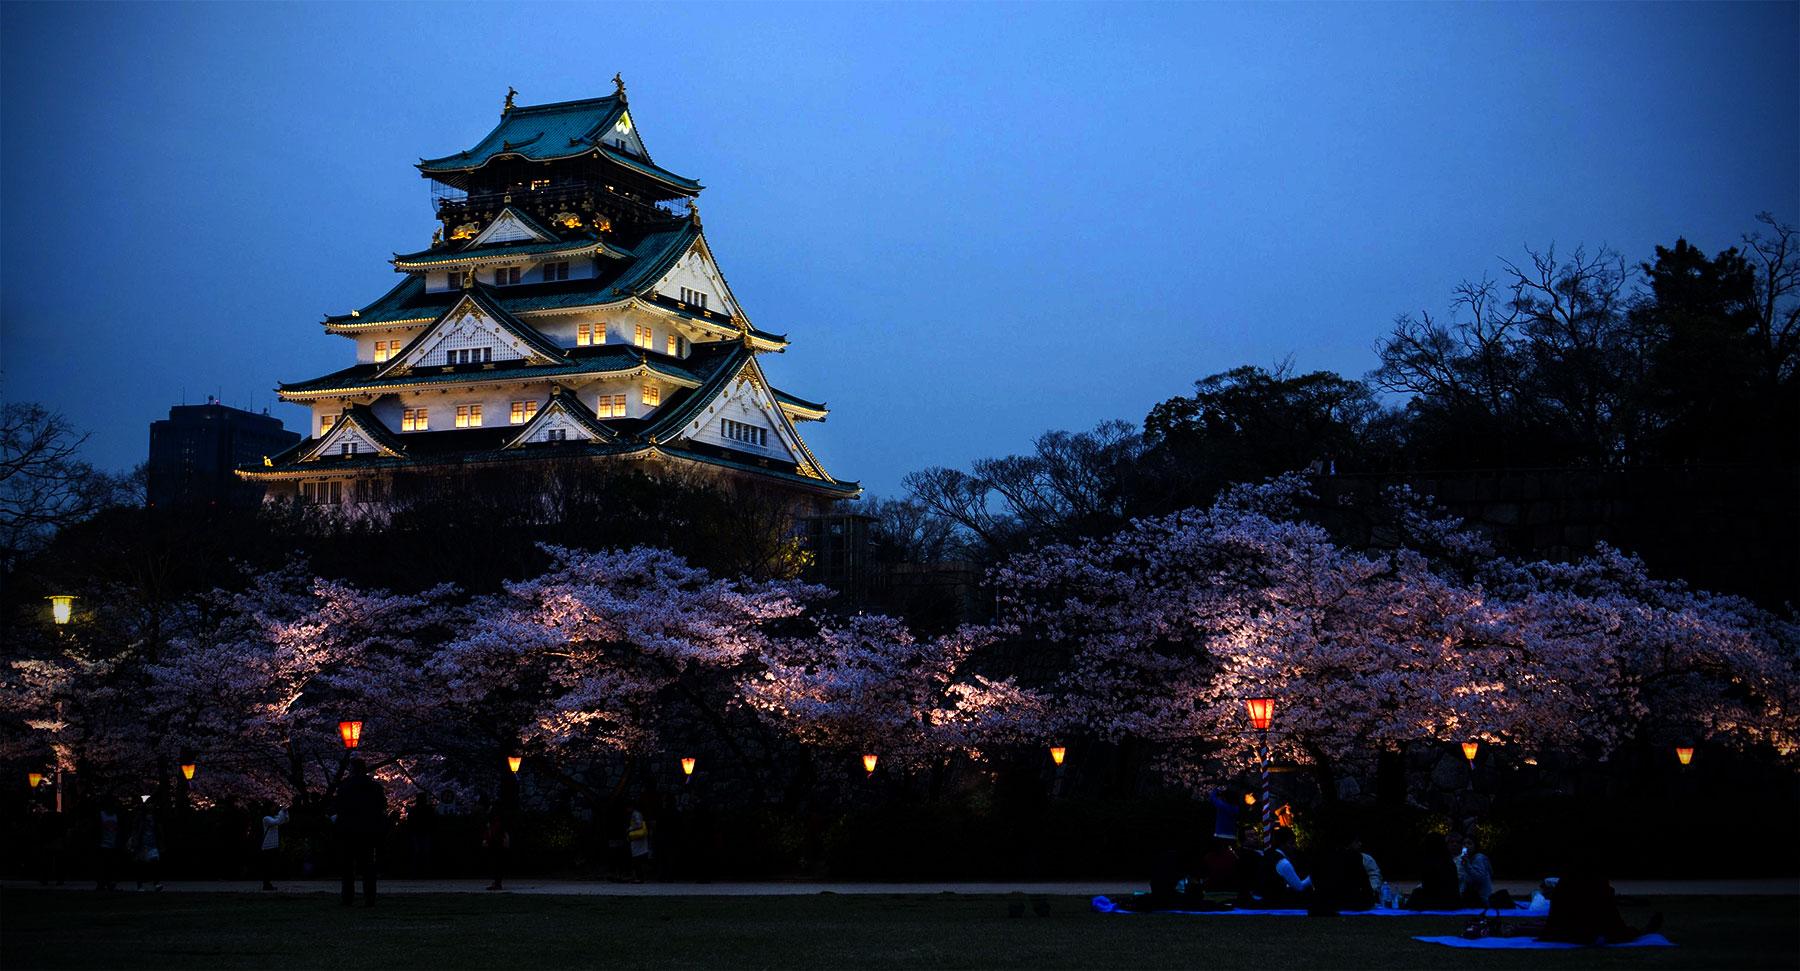 Understanding the 400th Anniversary of Osaka Castle